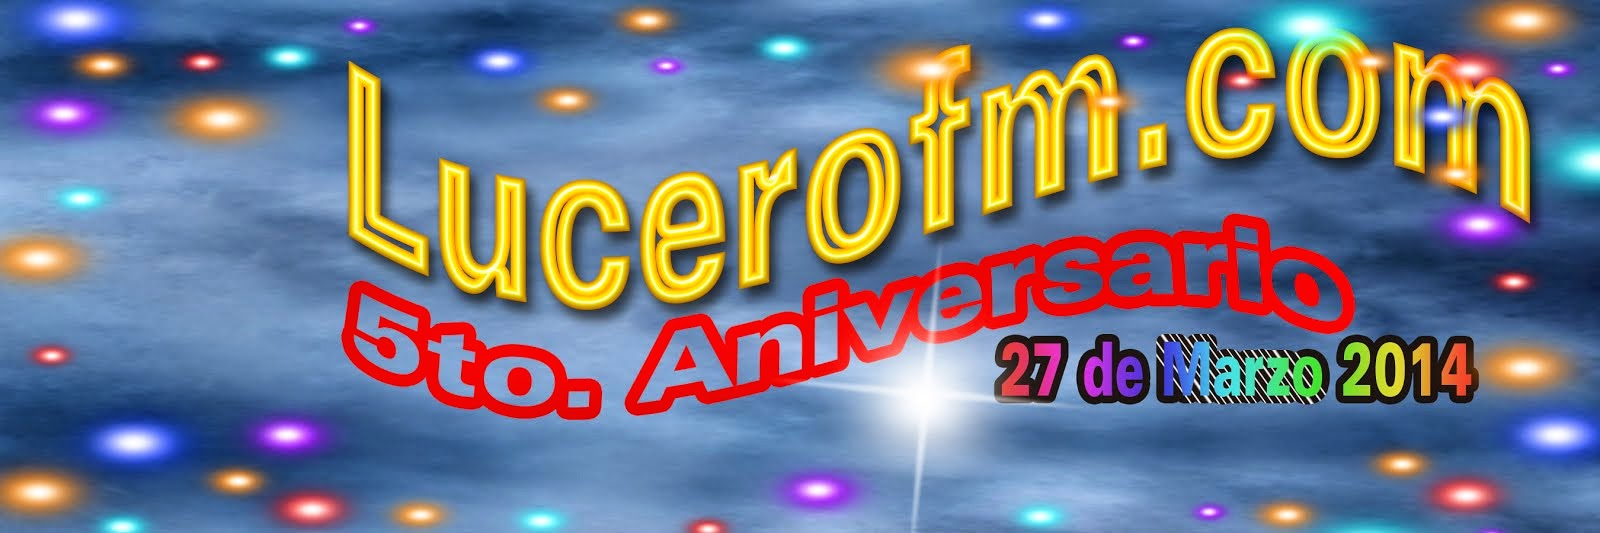 Lucerofm